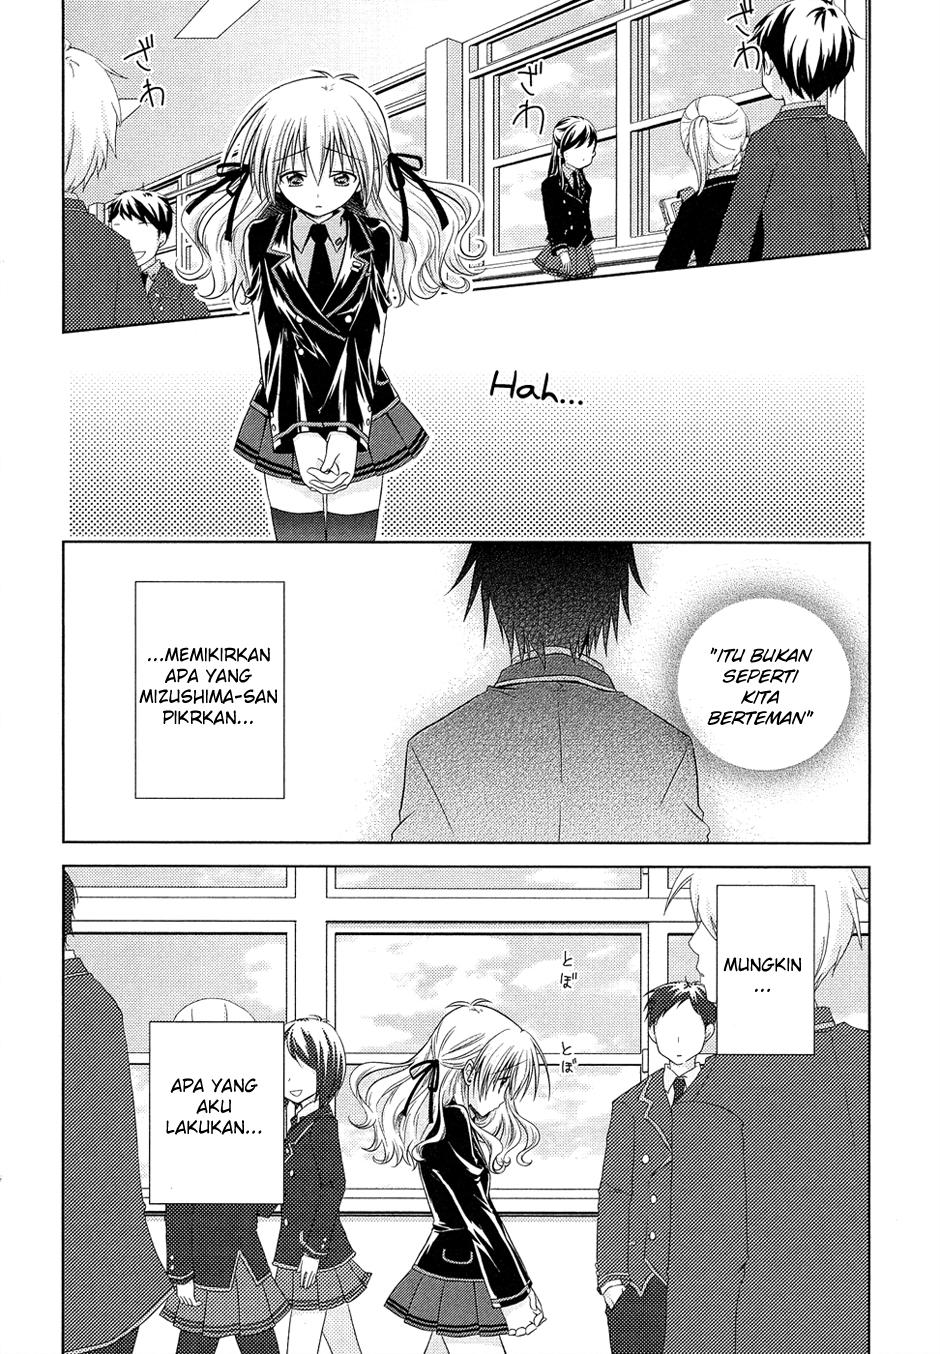 Komik iris zero 0010 11 Indonesia iris zero 0010 Terbaru 23|Baca Manga Komik Indonesia|